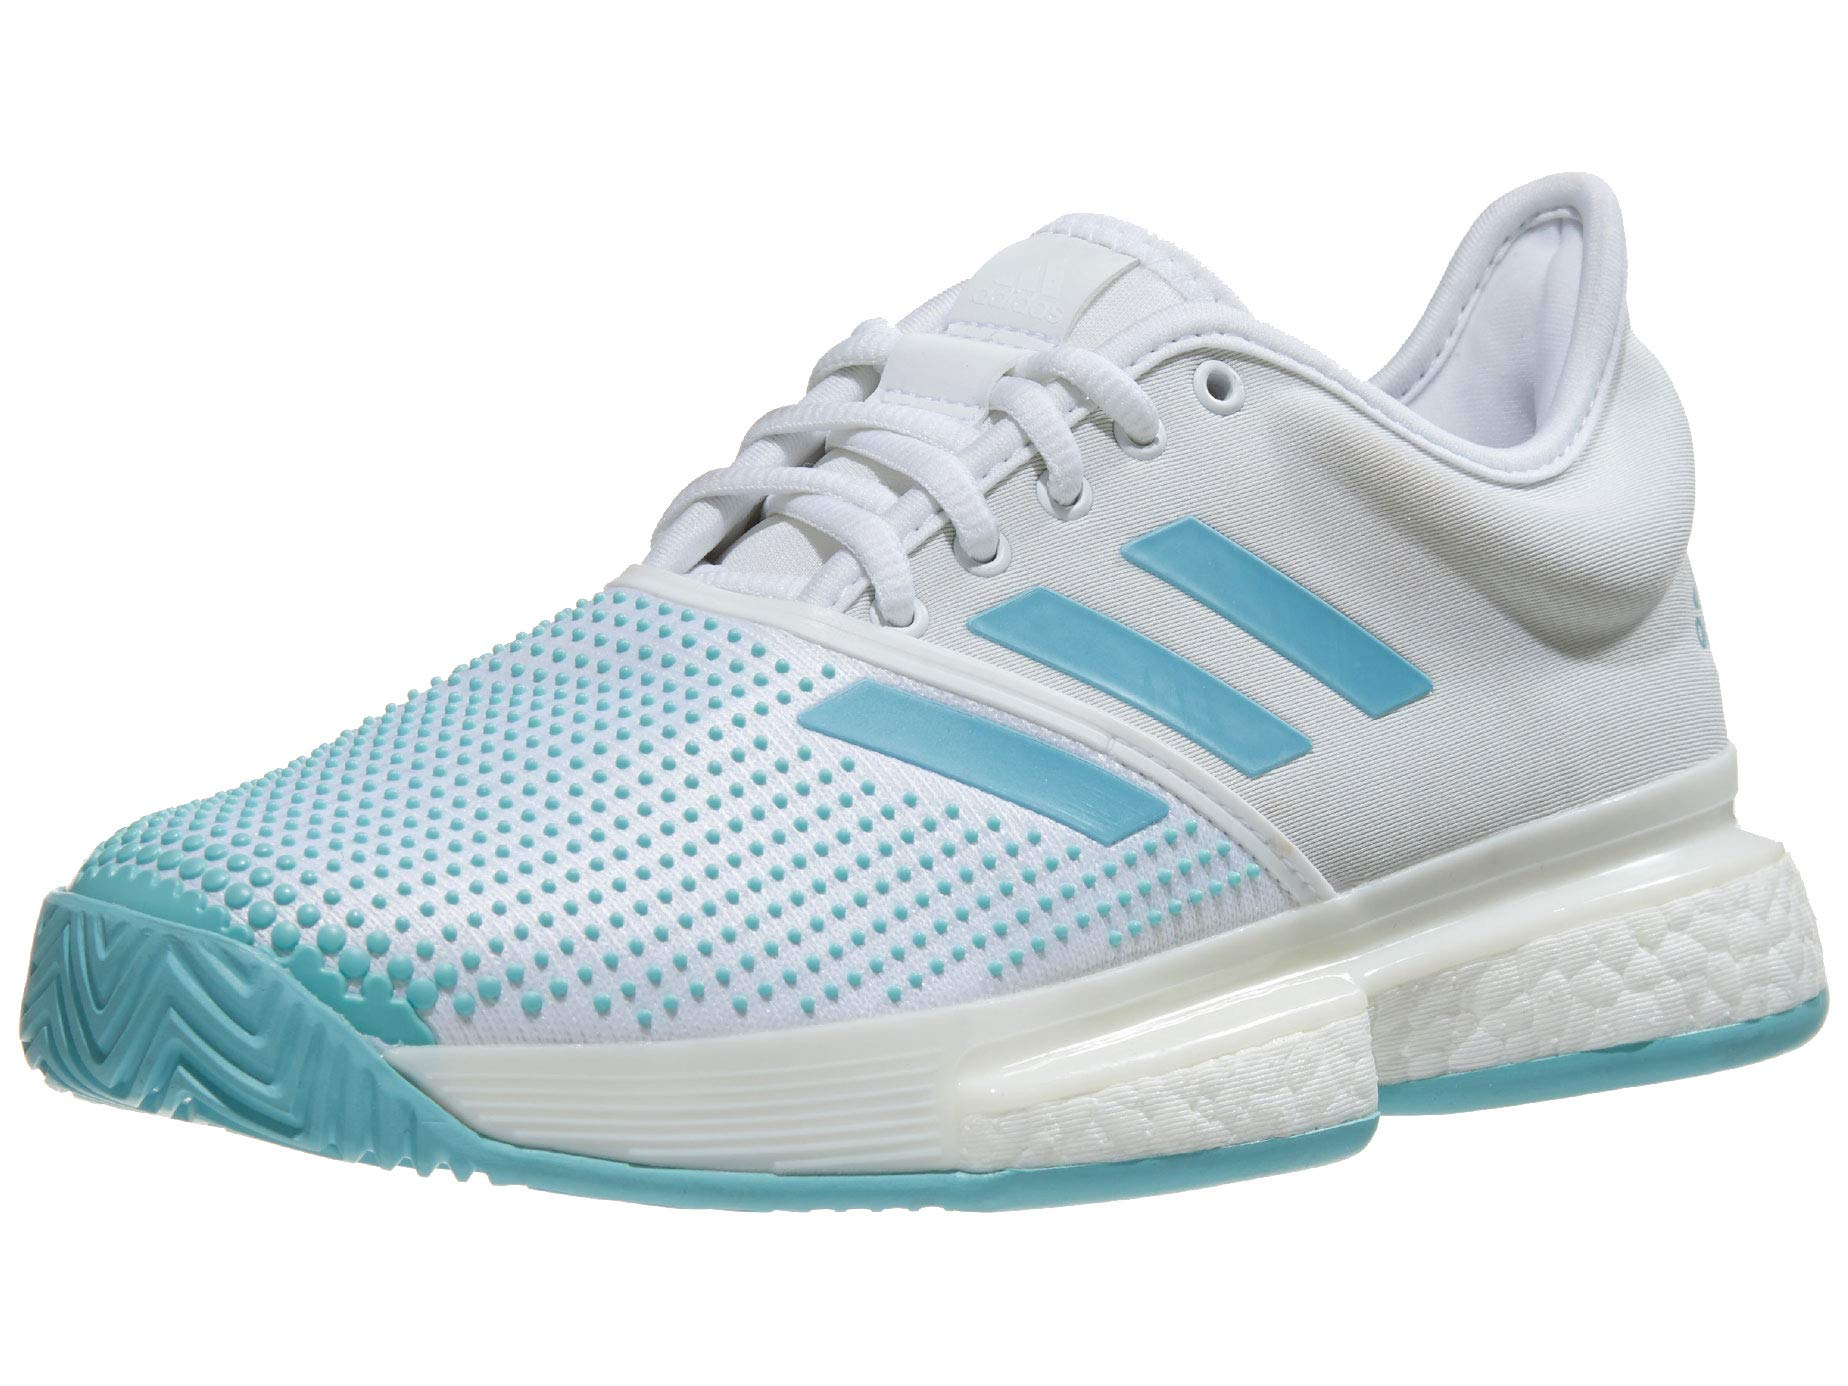 adidas SoleCourt X Parley Boost Women's Tennis Shoes